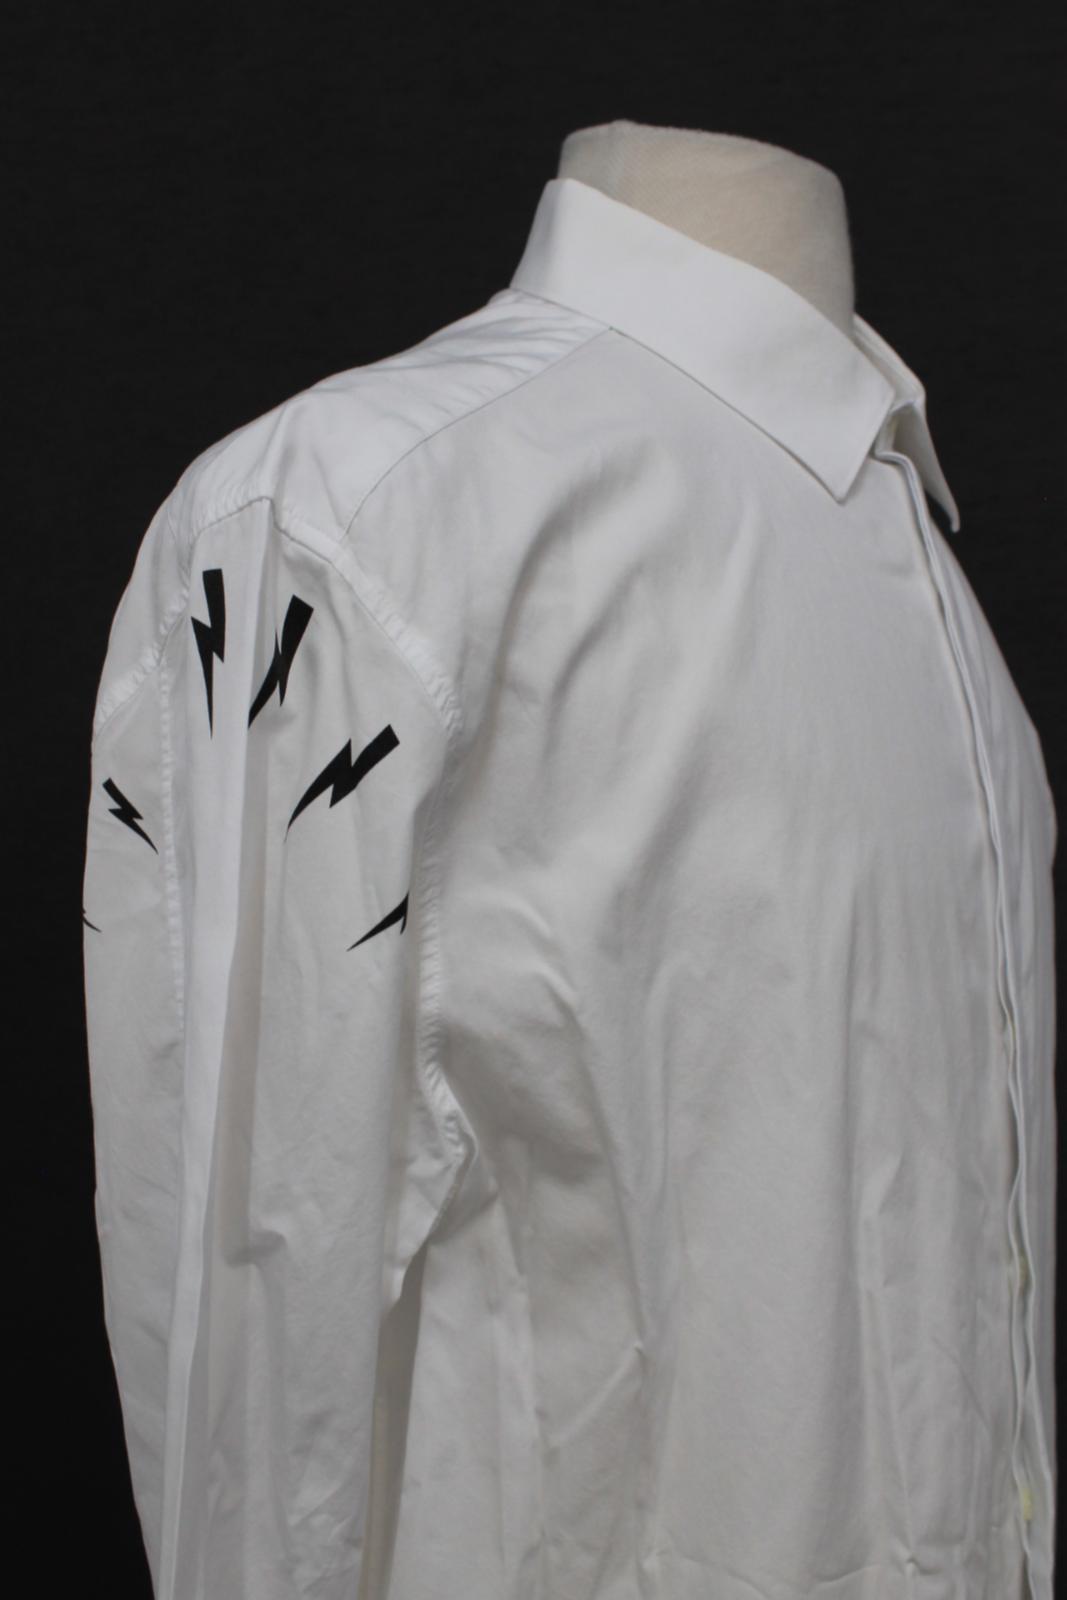 Neil-barrett-hombre-blanco-de-algodon-manga-de-Rayo-con-cuello-camisa-tamano-17-5-034 miniatura 9